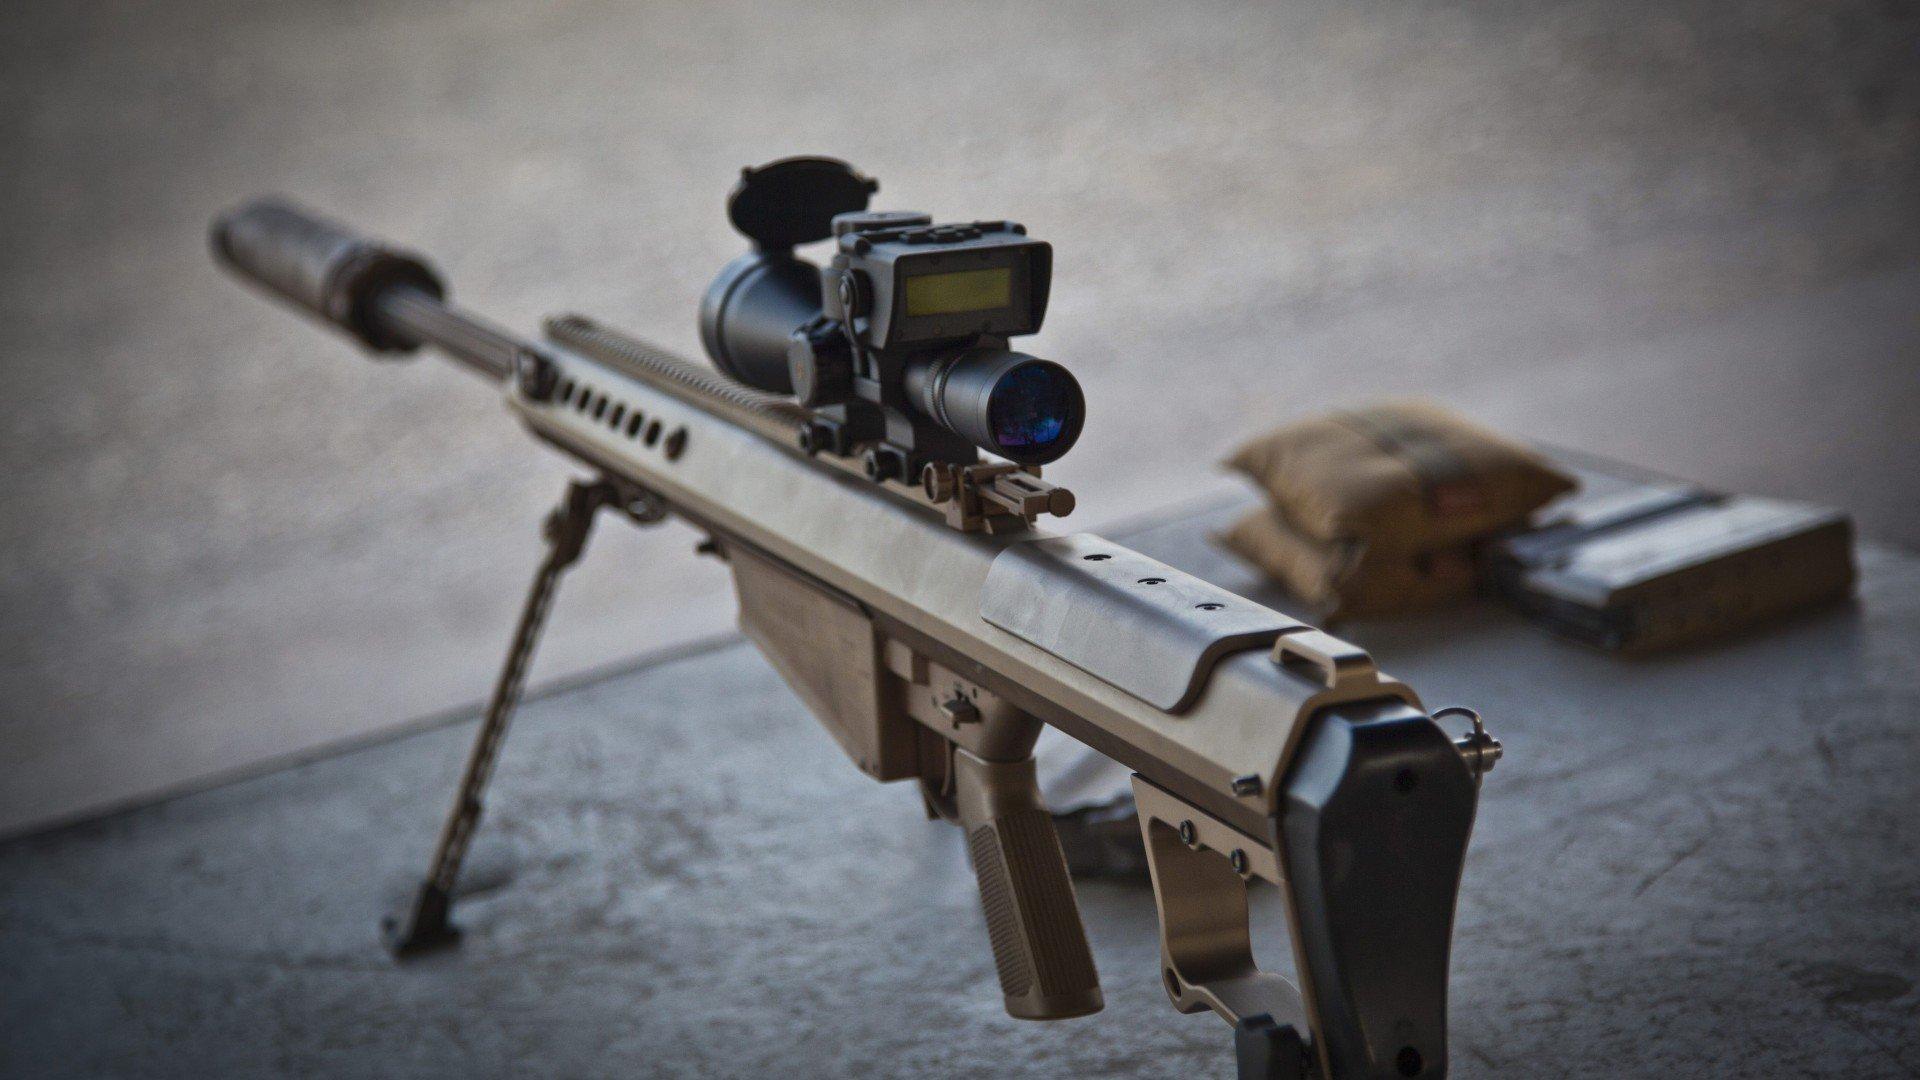 Gun barrett m82 barrett 50 cal barrett m82 a1 sniper rifle scopes hd wallpapers desktop - Barrett 50 wallpaper ...